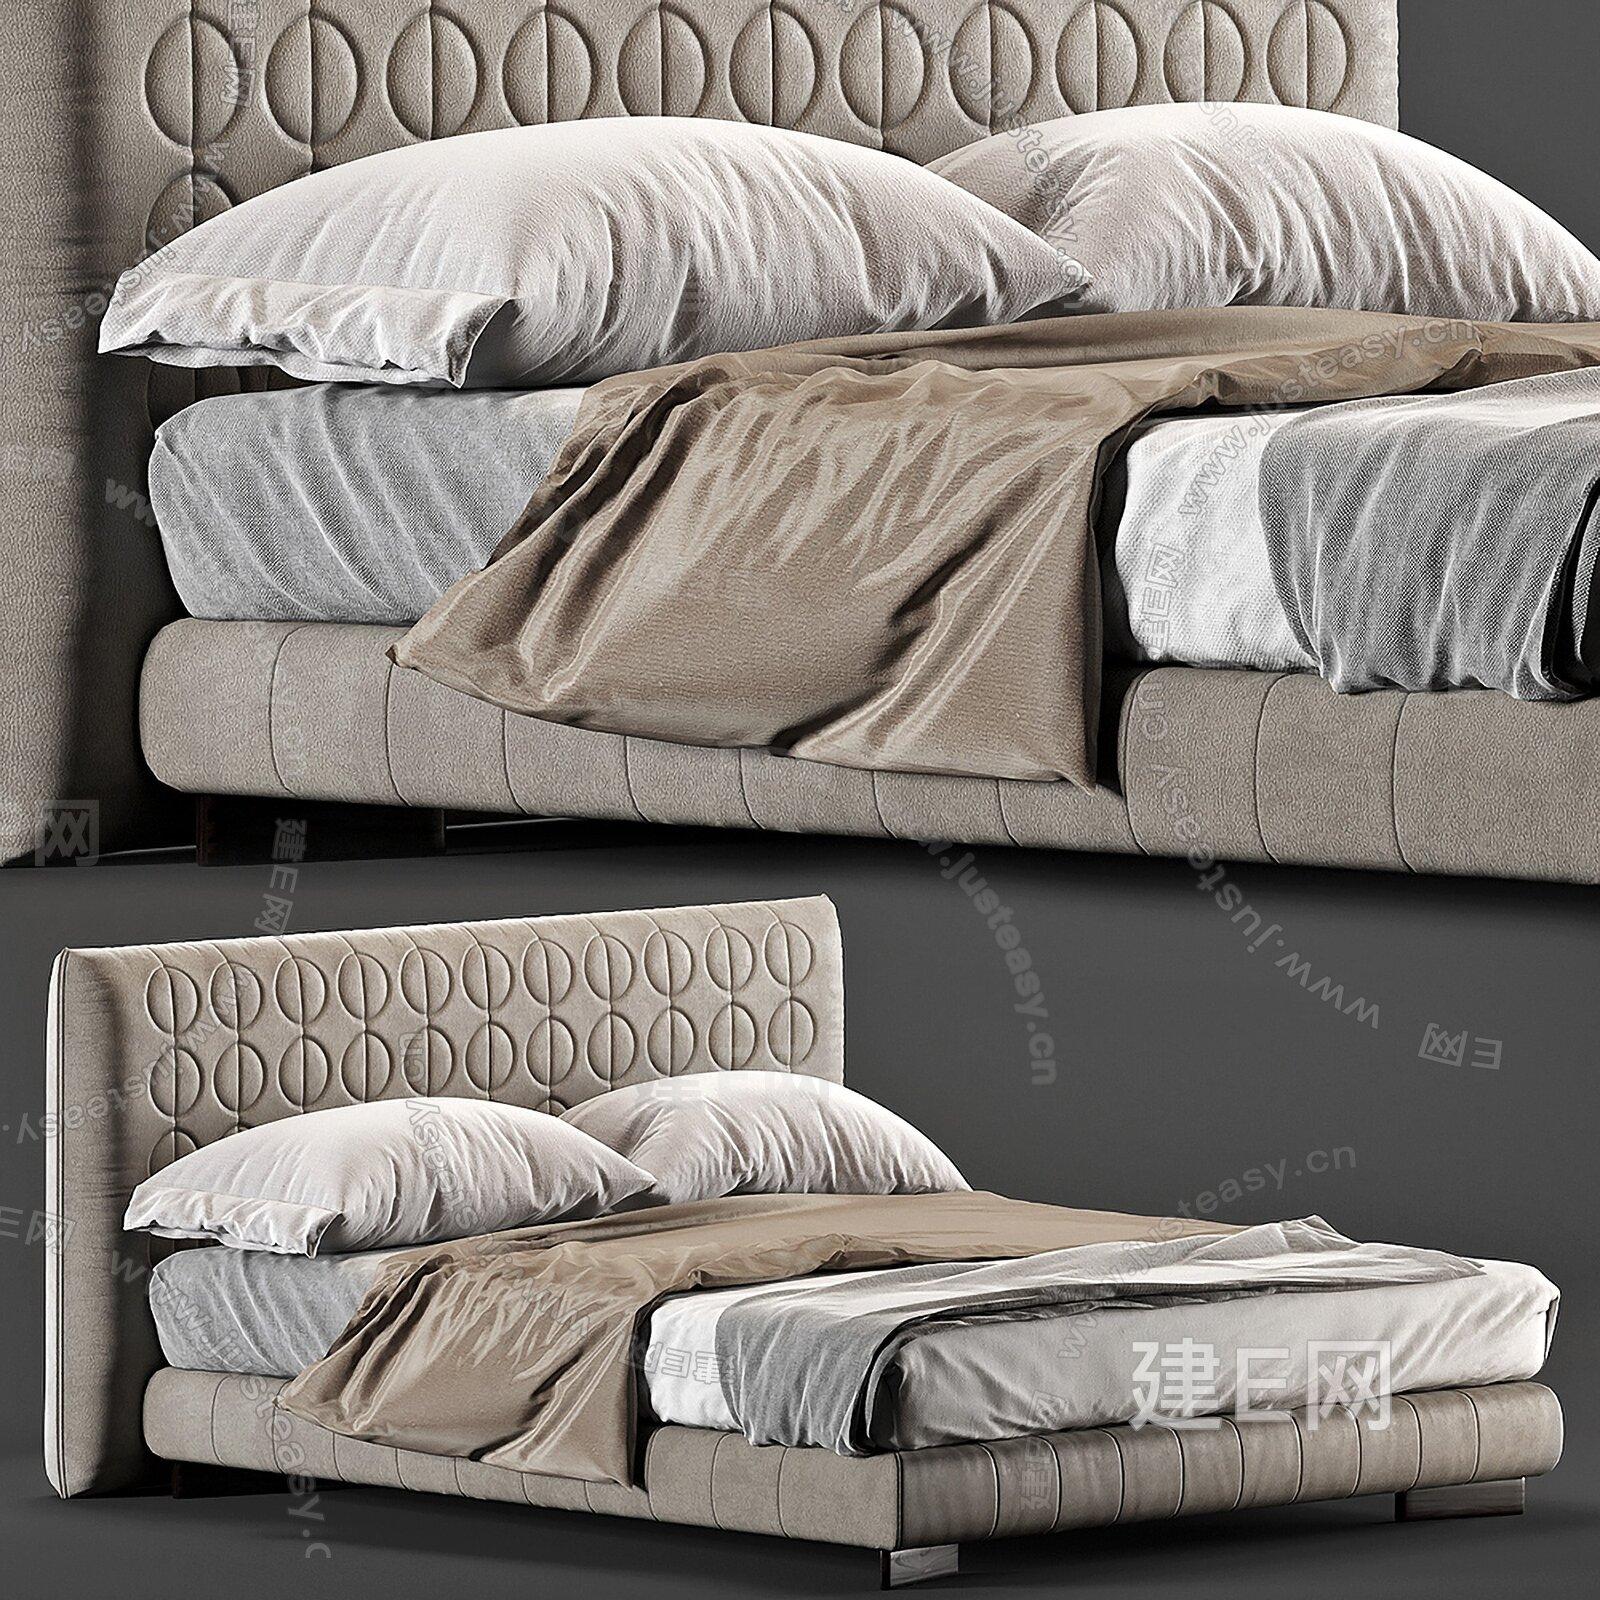 Minotti 现代轻奢双人床3d模型